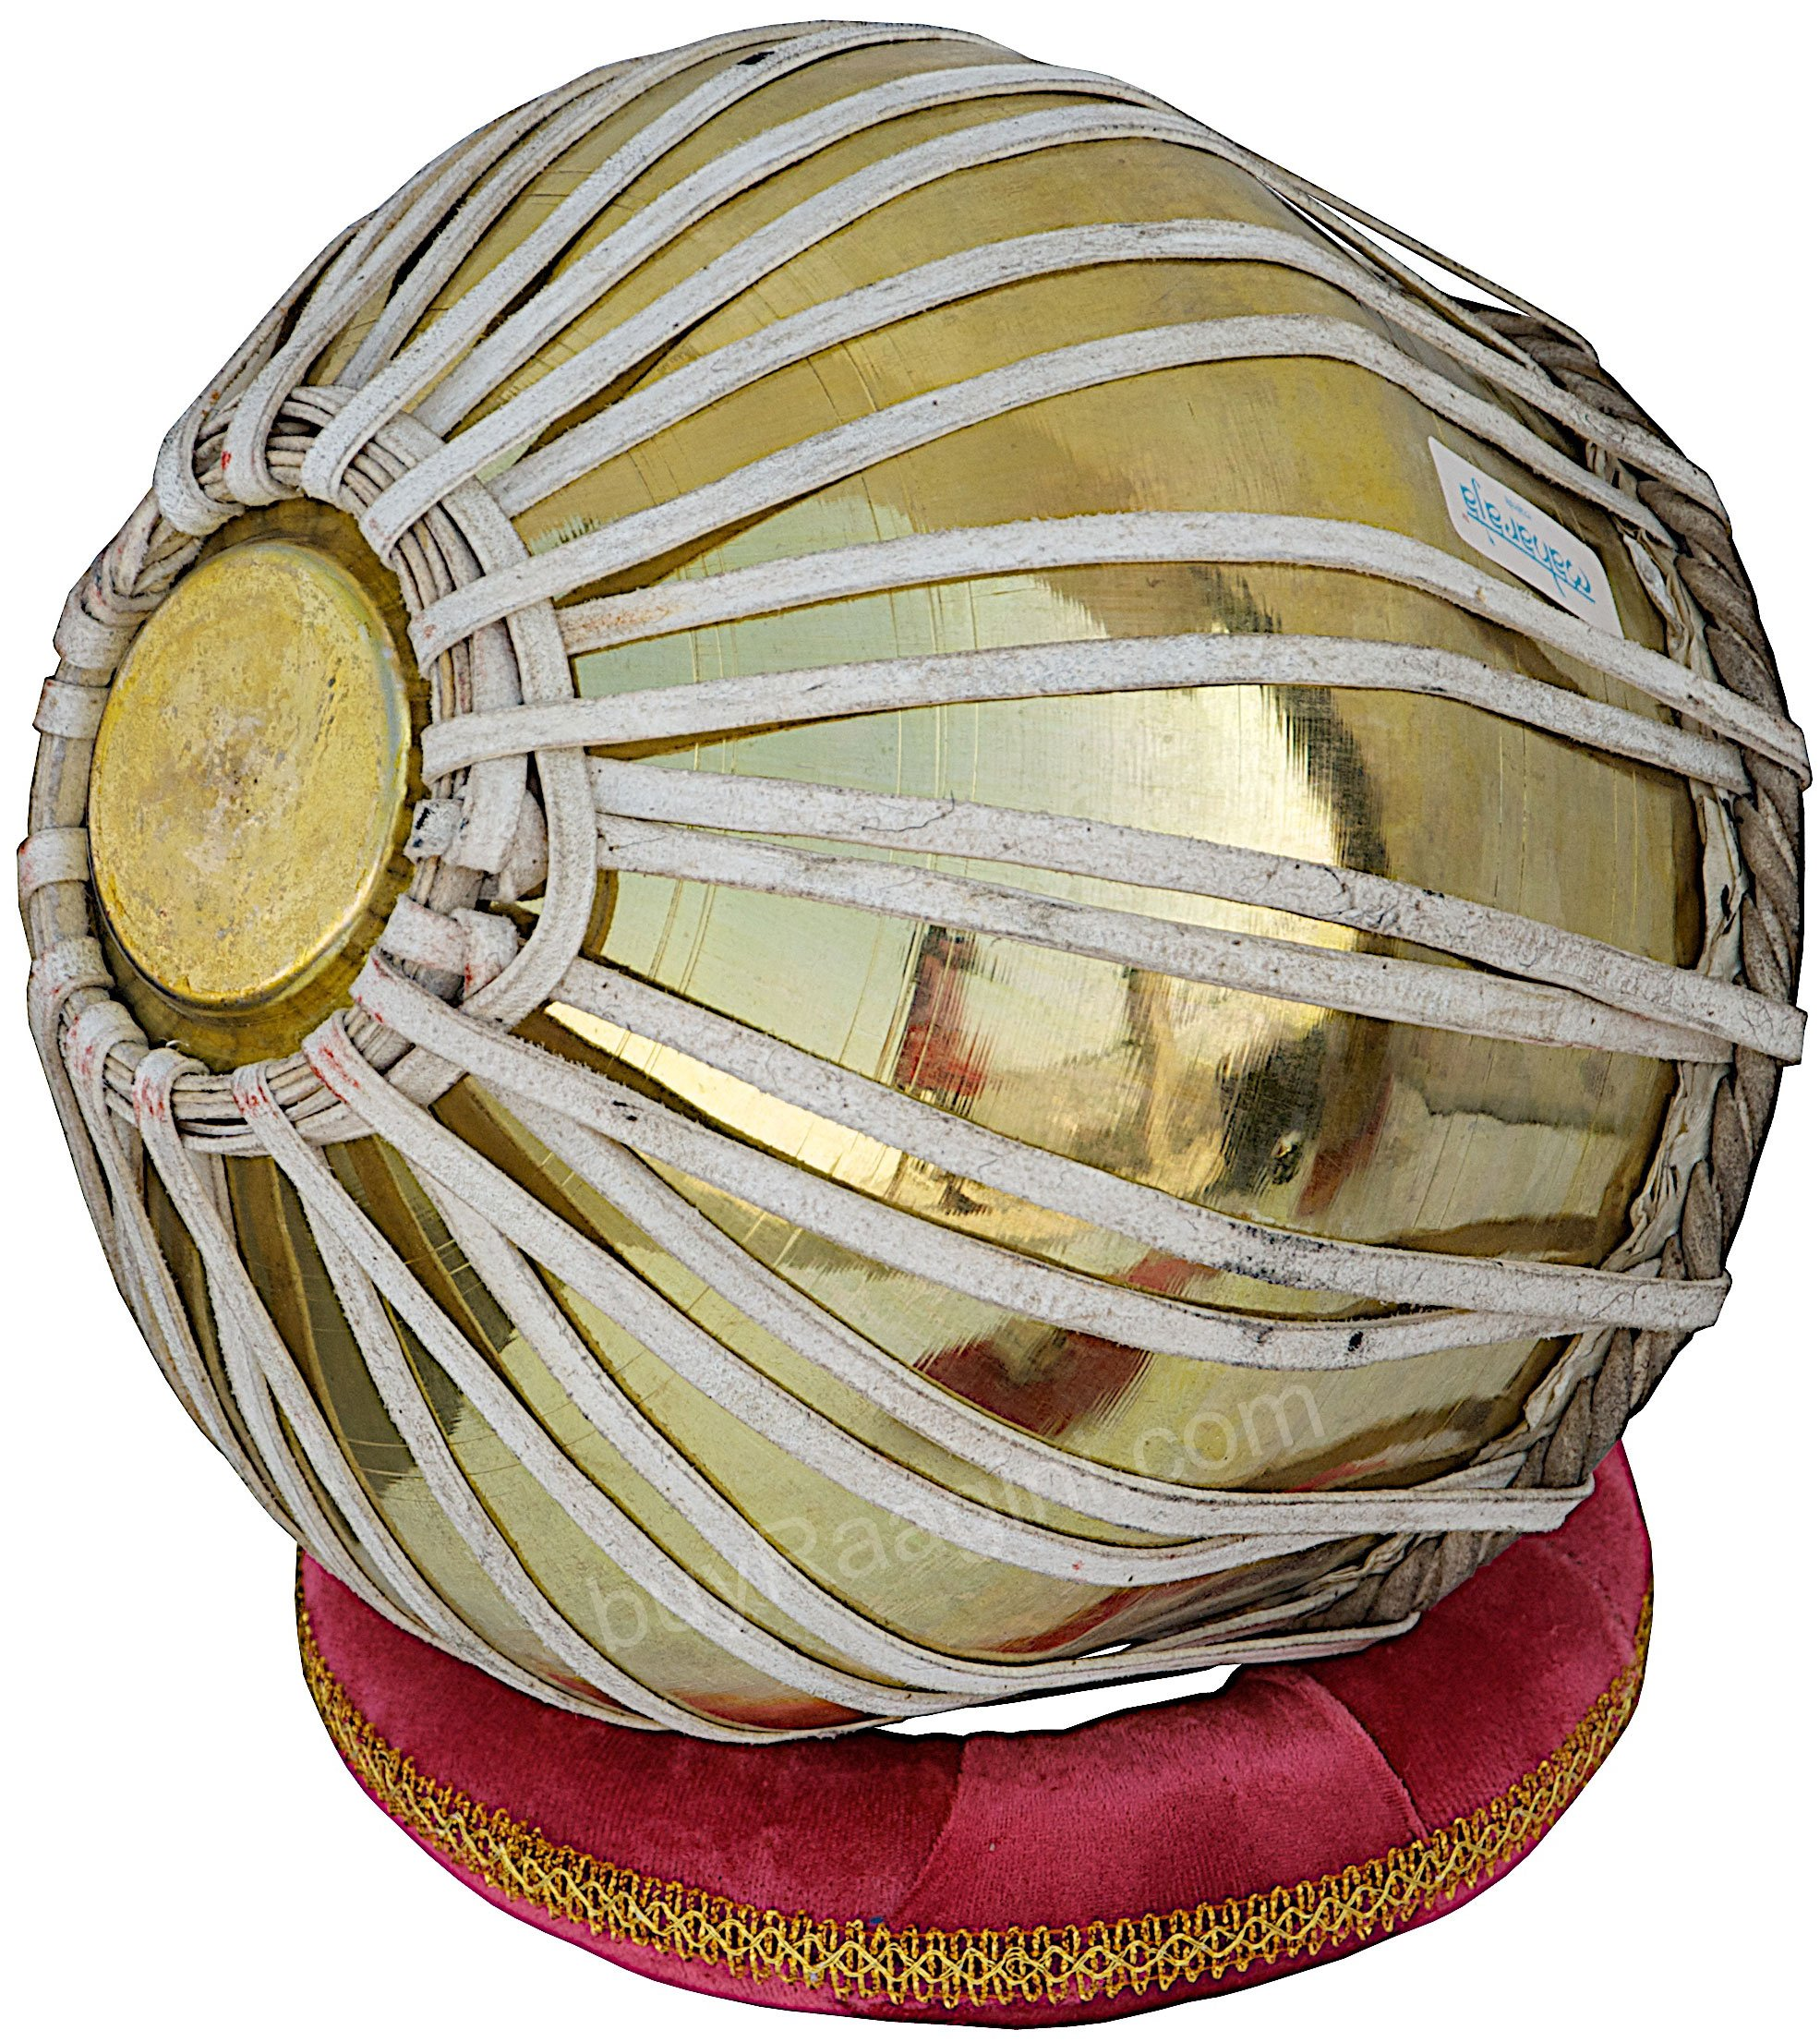 Tabla Set by Maharaja Musicals, Golden Brass Bayan 3Kg, Sheesham Dayan Tabla, Nylon Bag, Hammer, Book, Cushions, Cover, Tabla Indian Drums (PDI-CH) by Maharaja Musicals (Image #7)